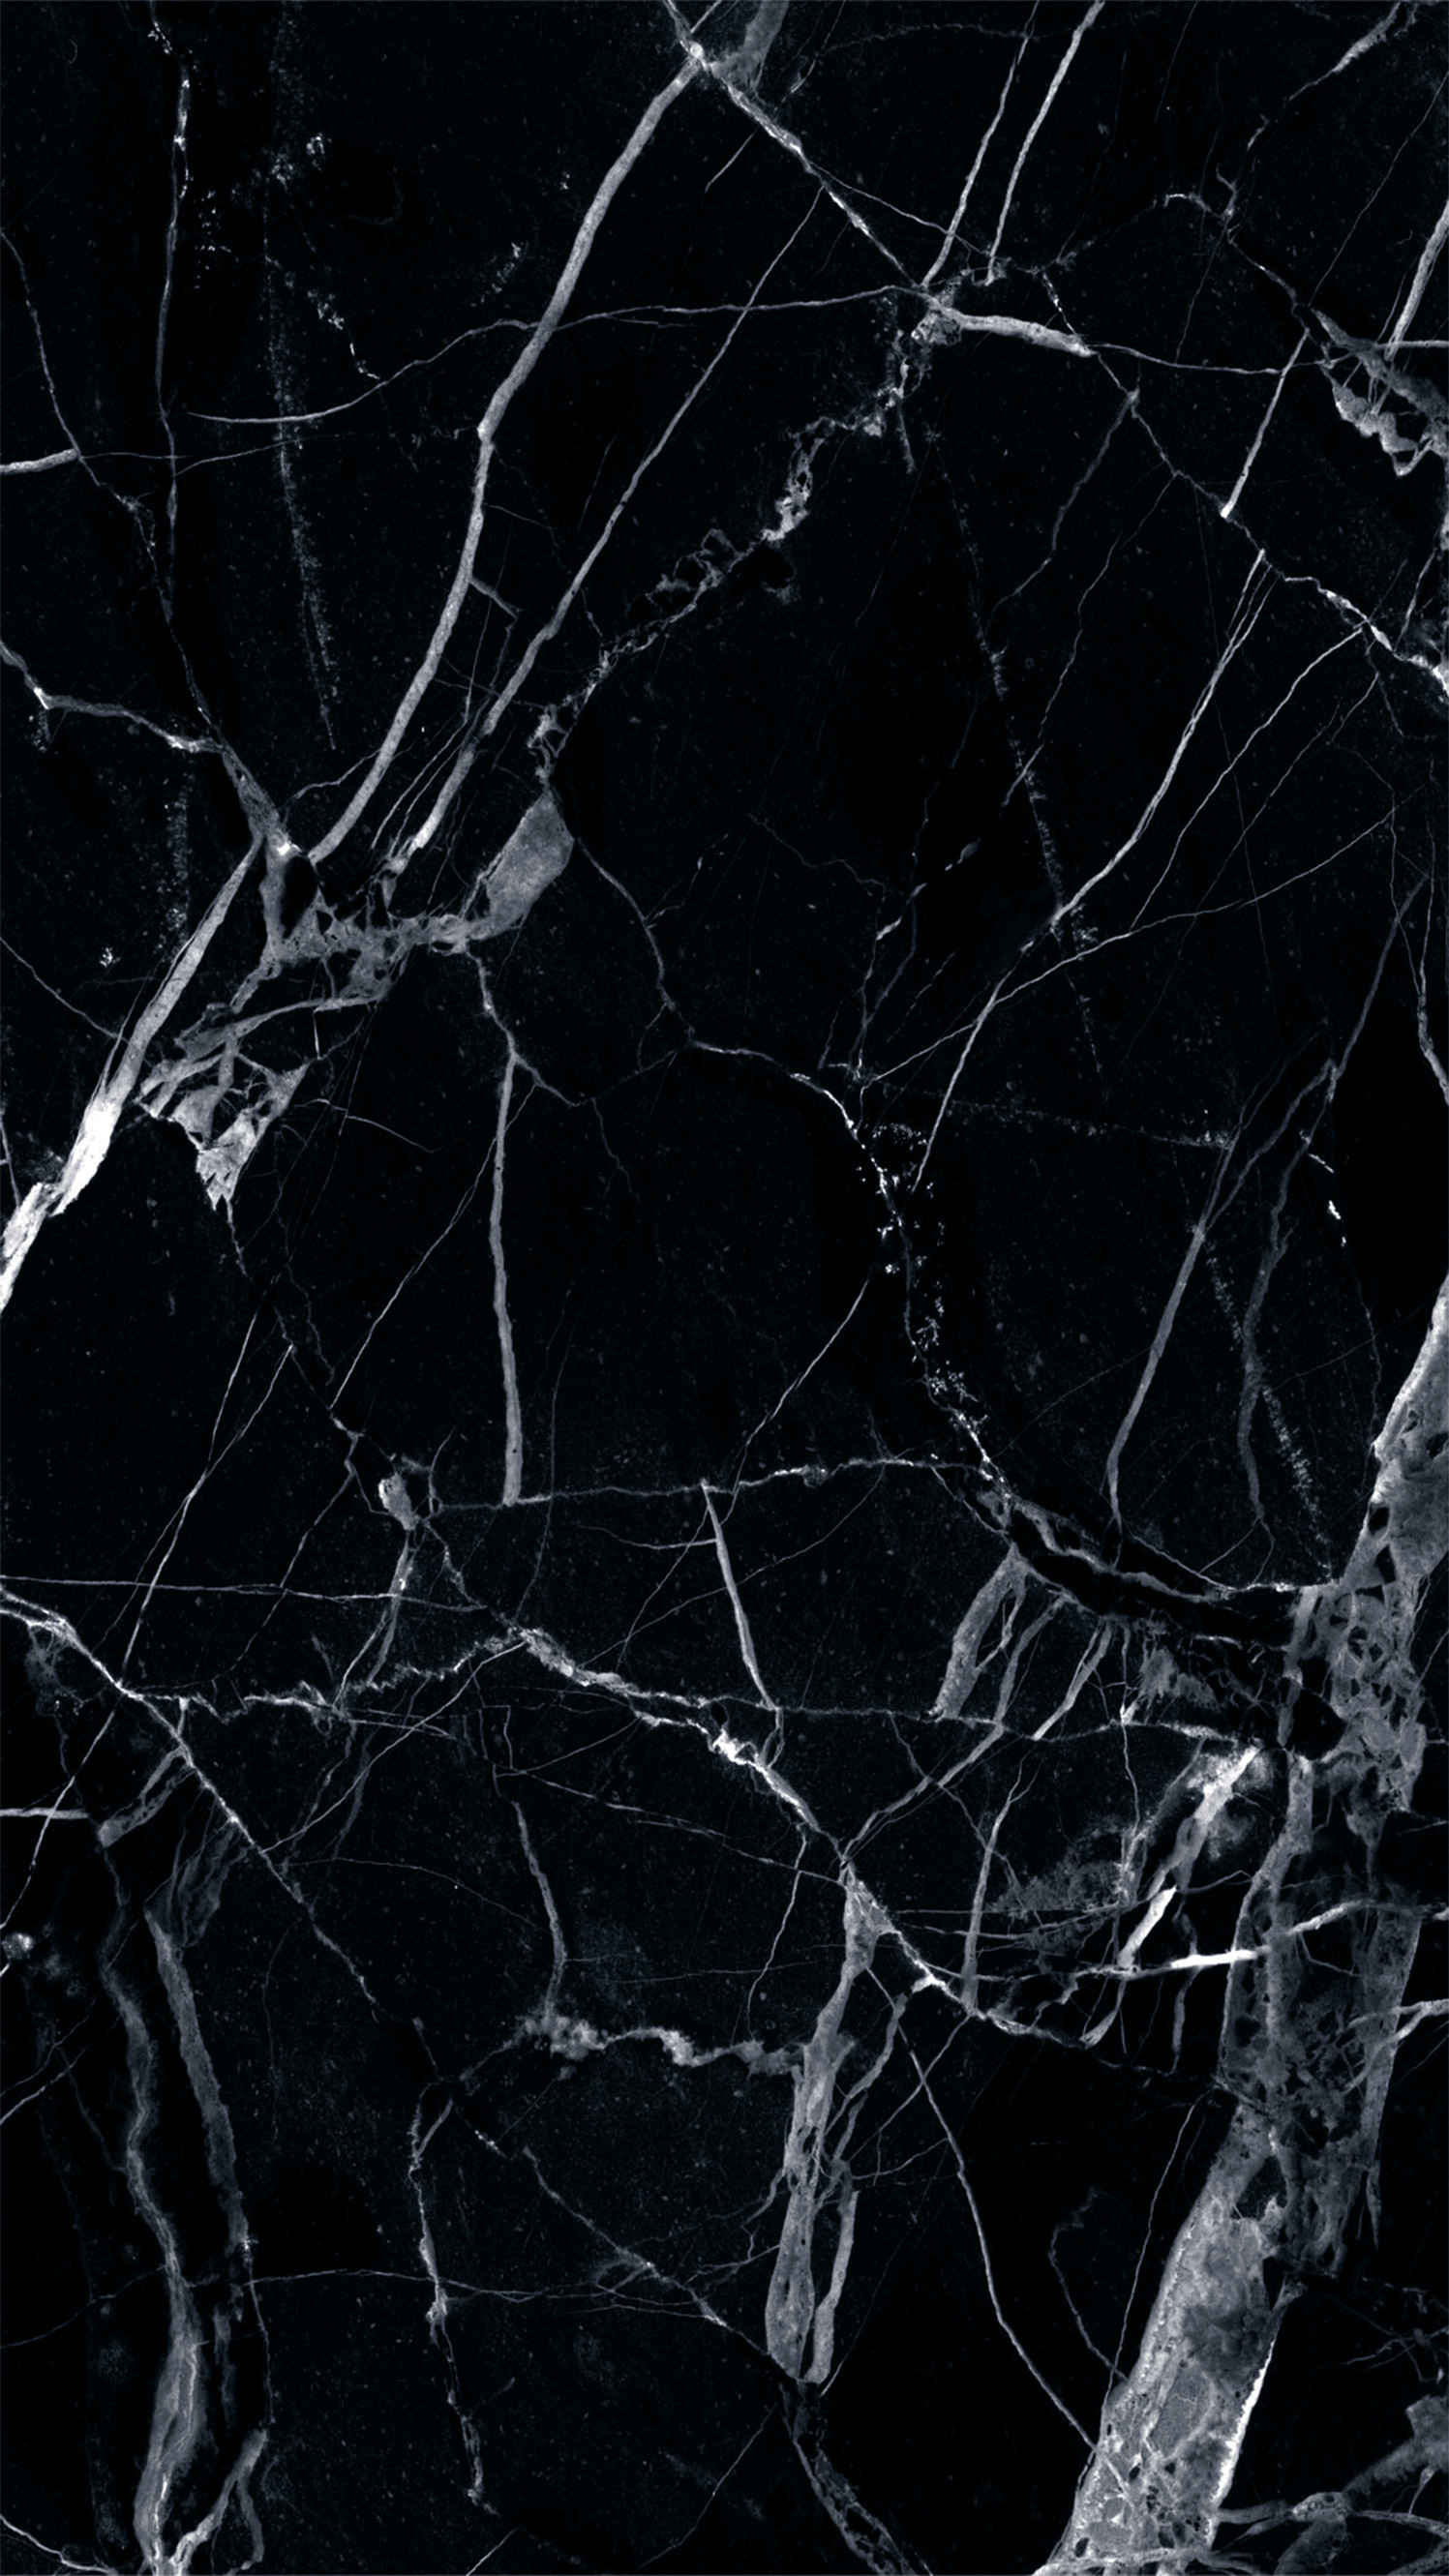 Realistic Broken Screen Wallpaper Hd 64 Images